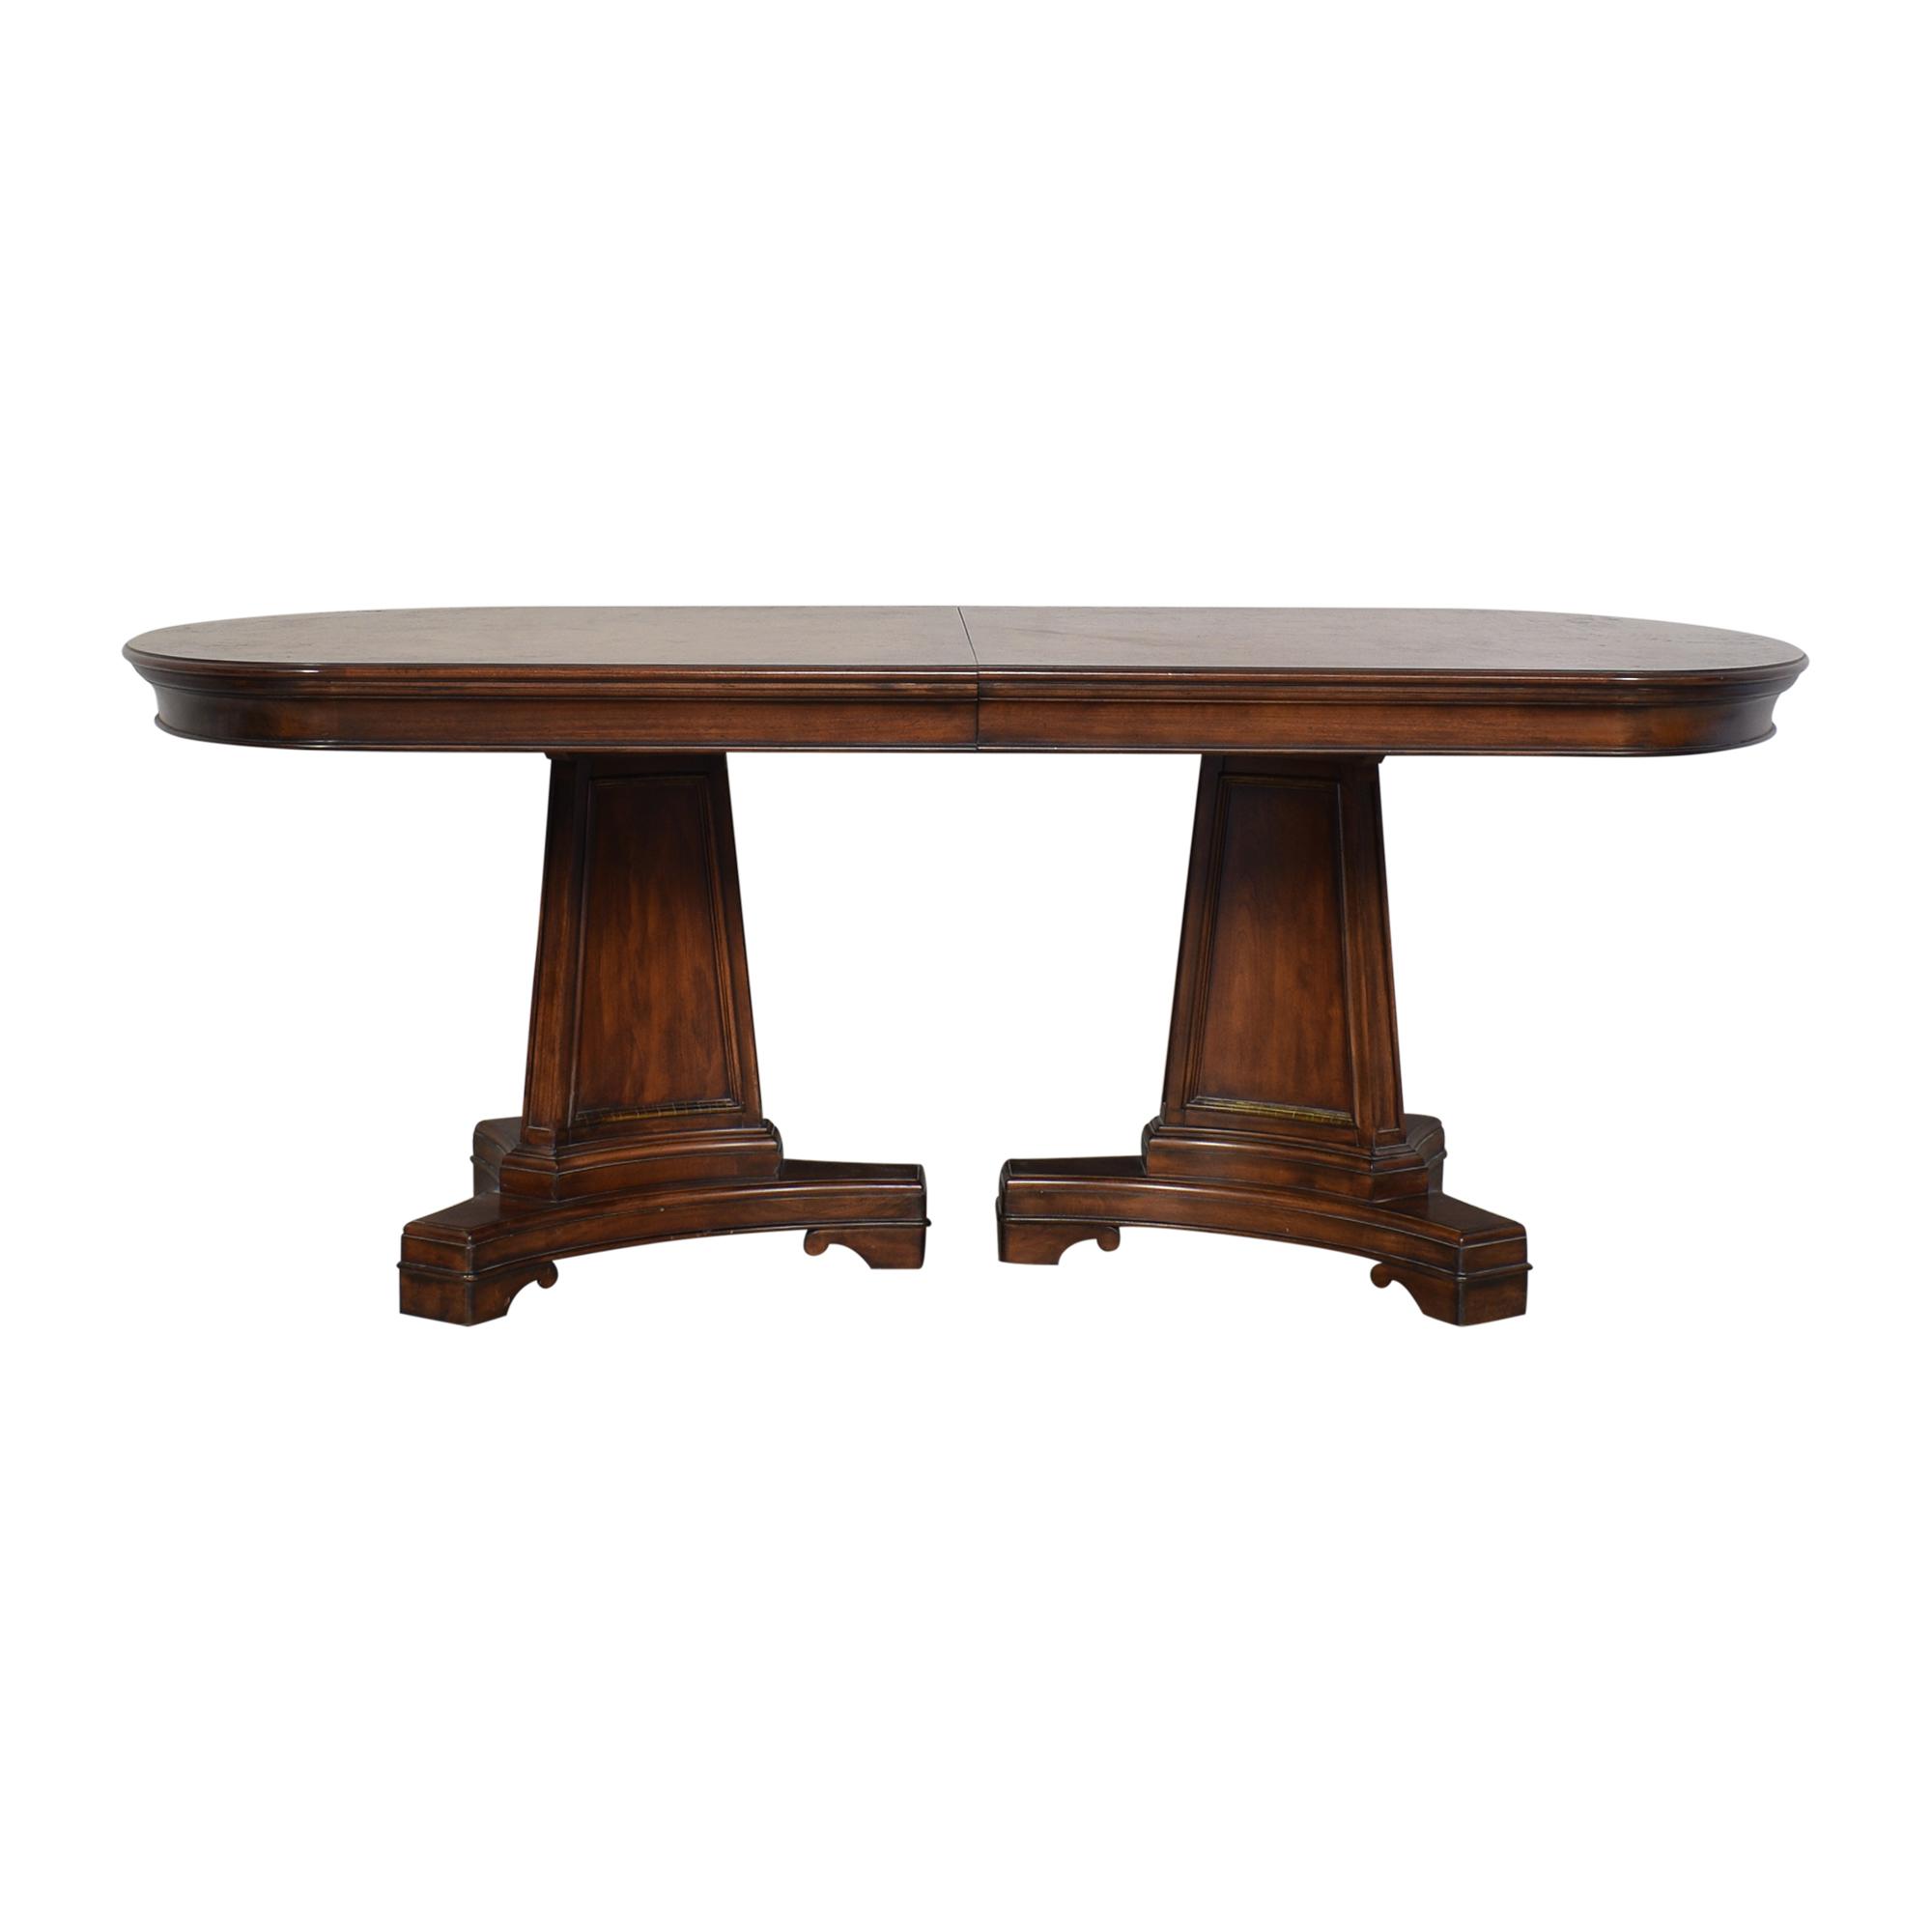 buy Thomasville Deschanel Double Pedestal Dining Table Thomasville